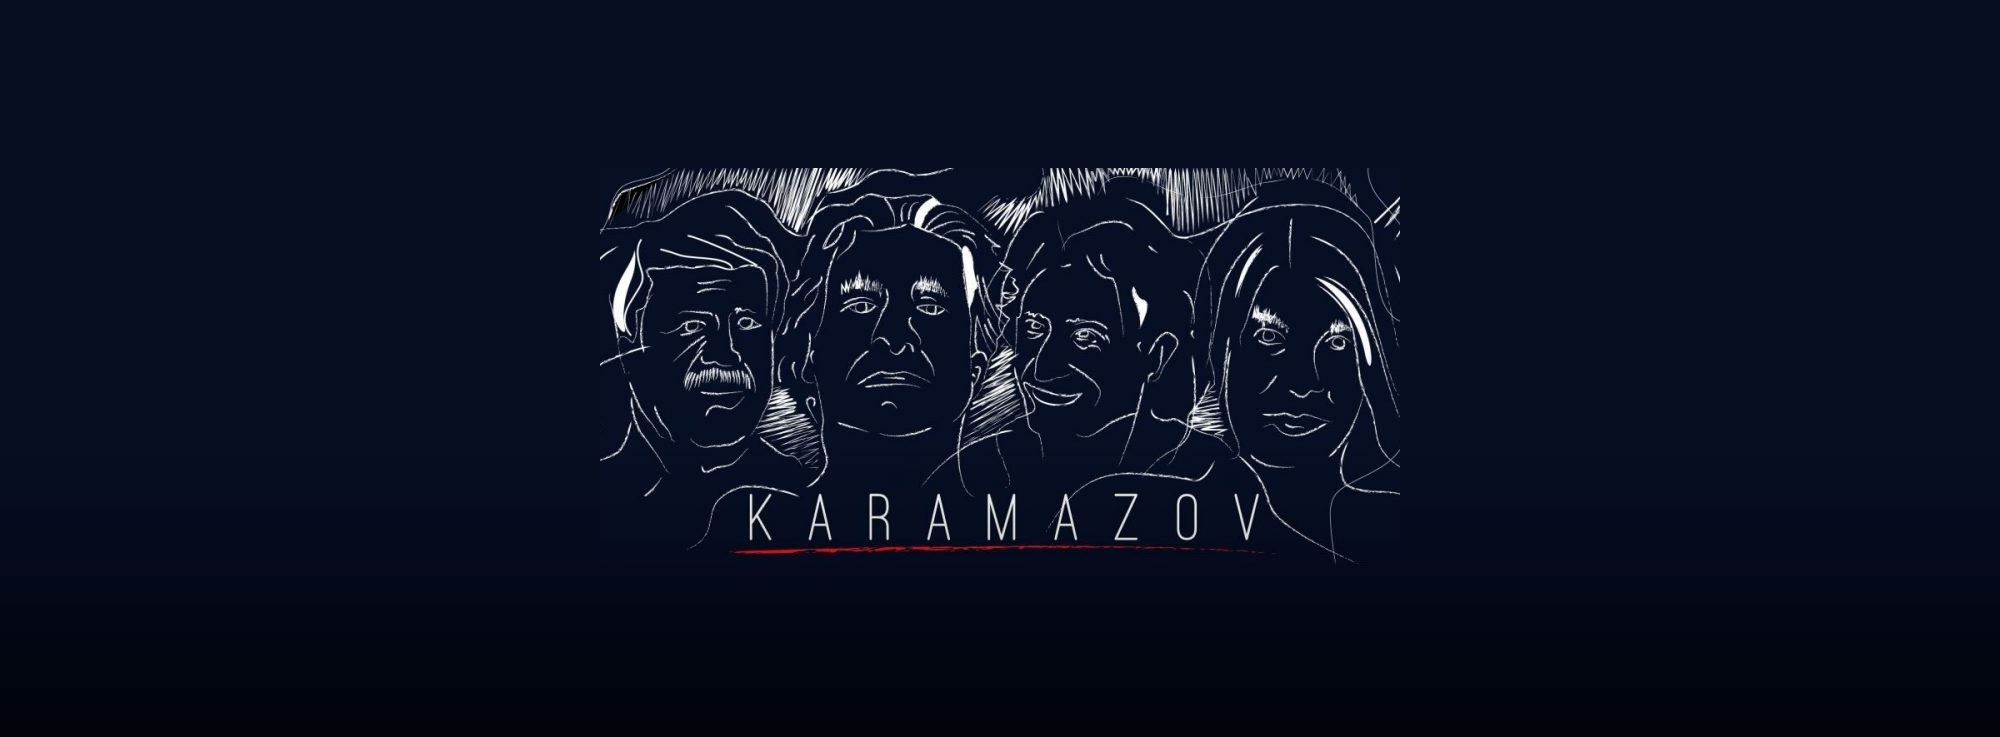 Francavilla Fontana: Karamazov